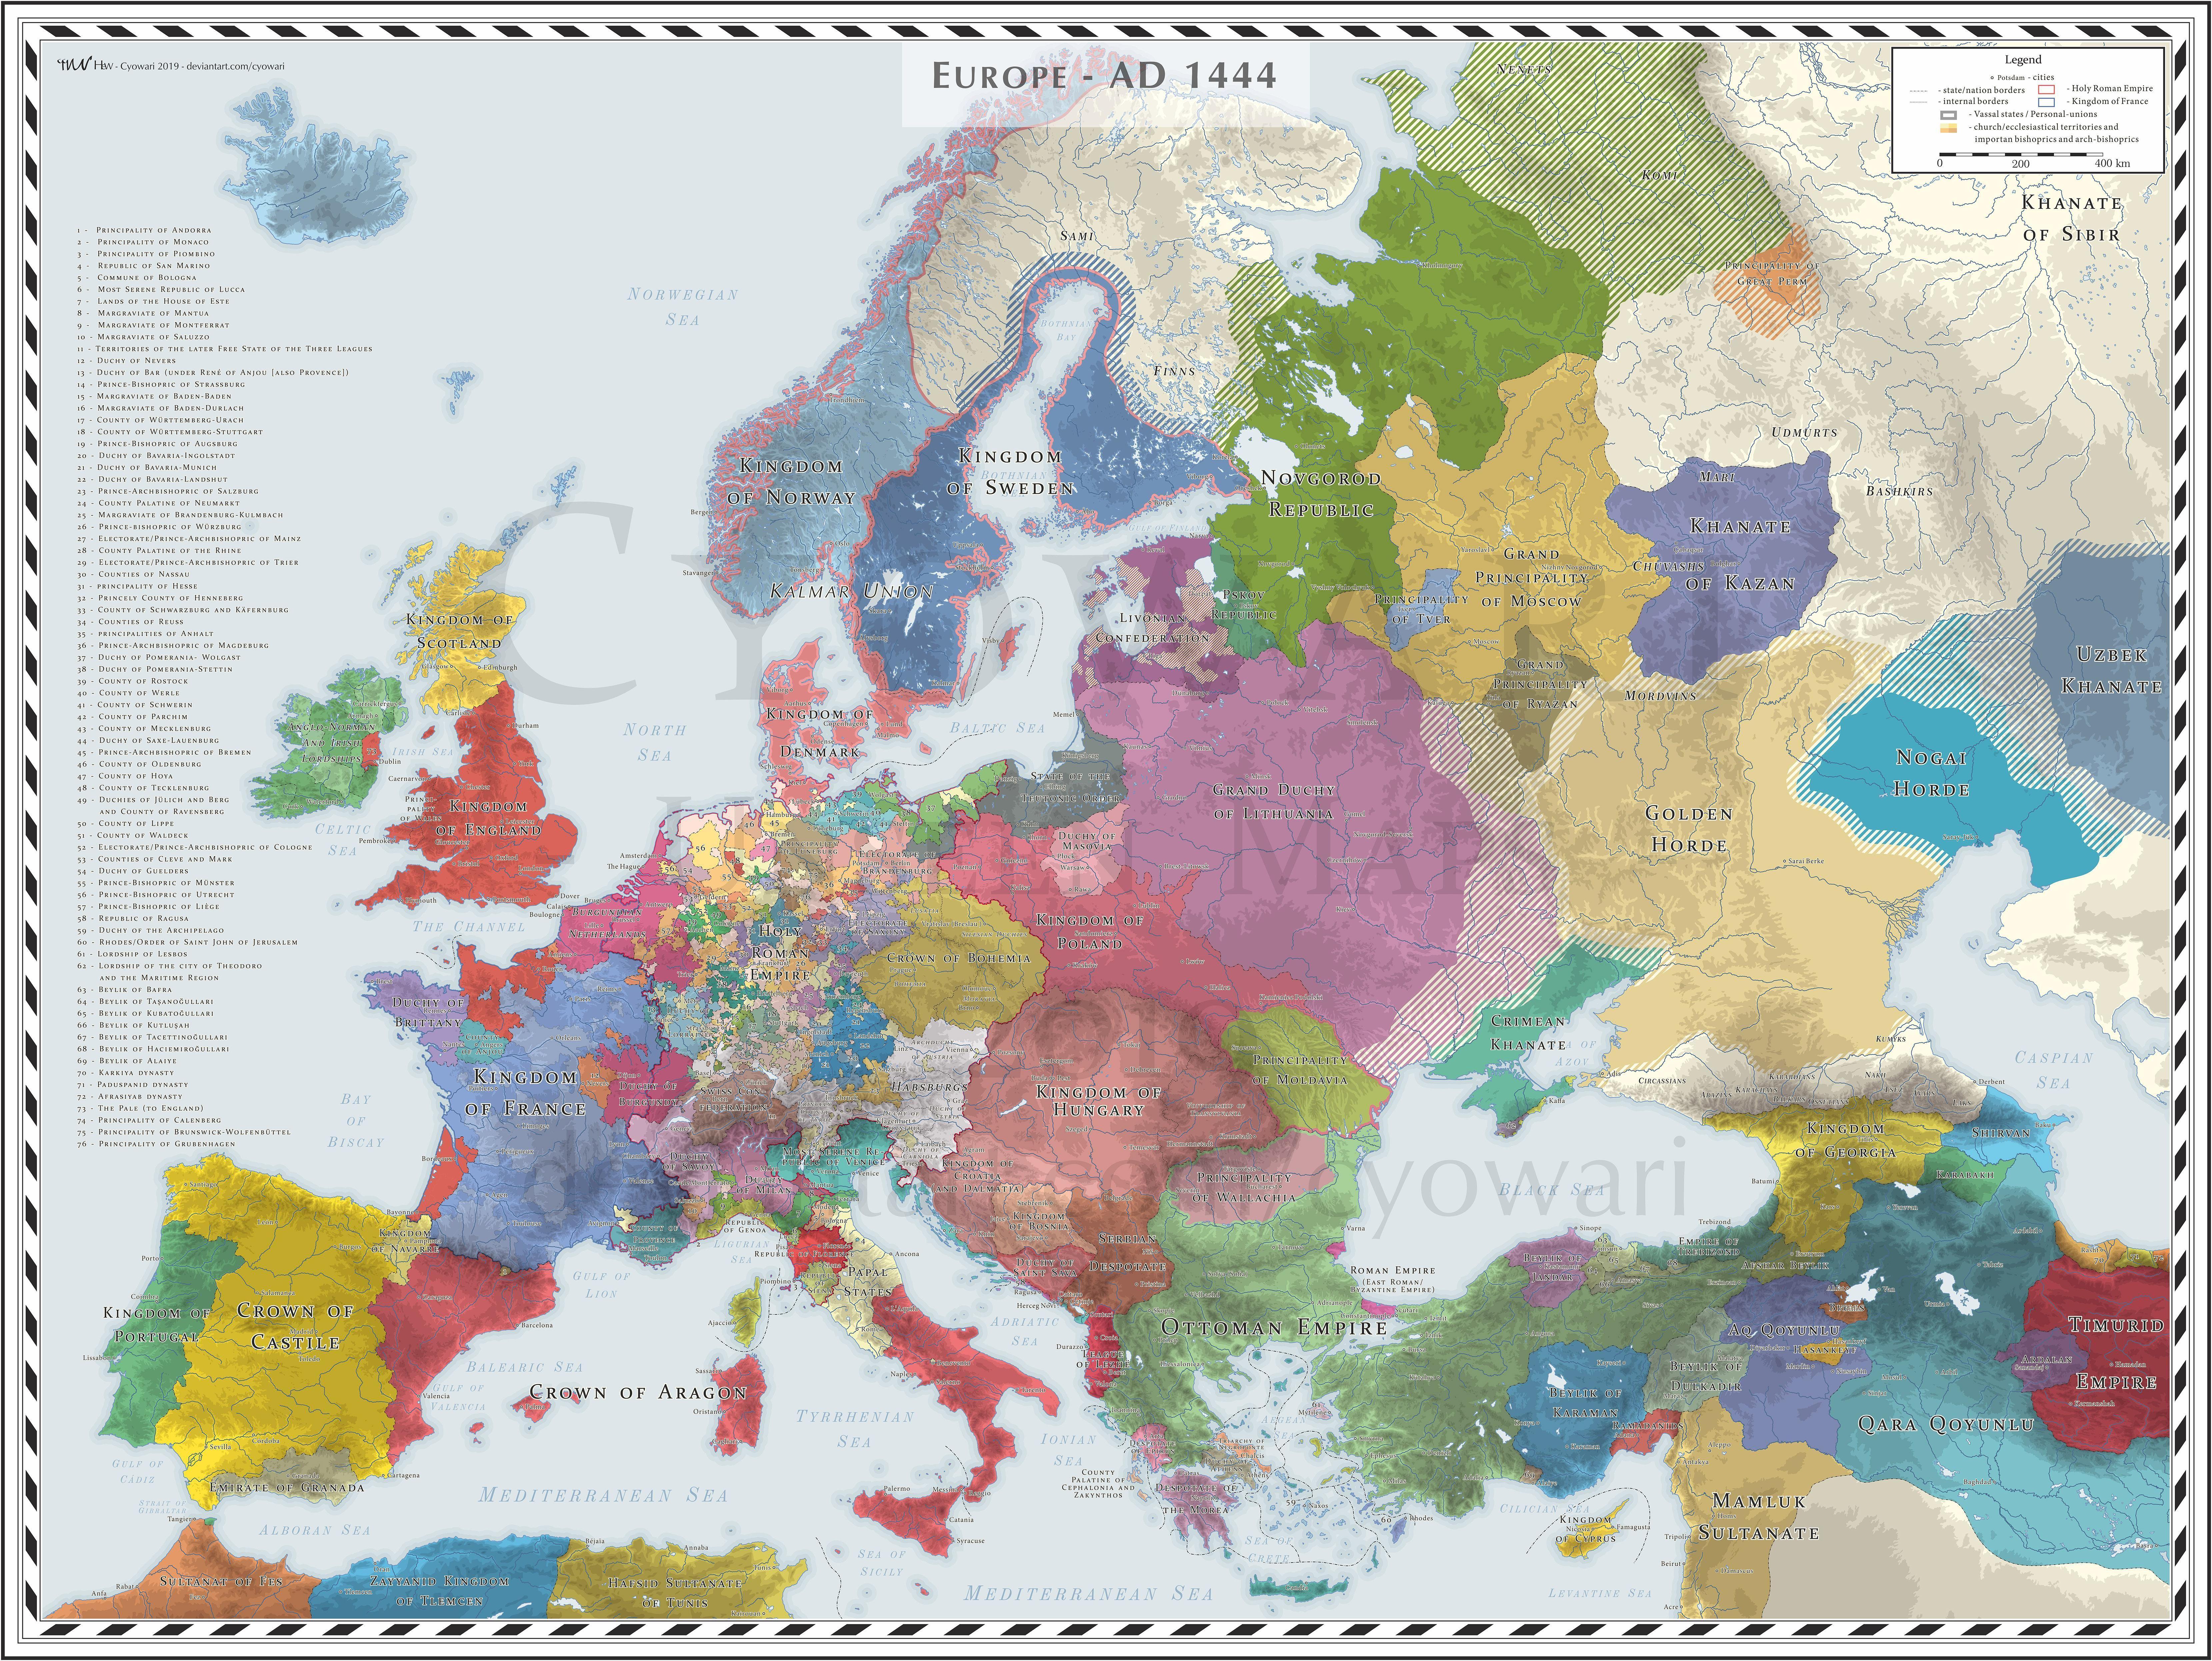 map of europe 1444 Europe (Detailed)   AD 1444   EU4 like Colours | World map europe